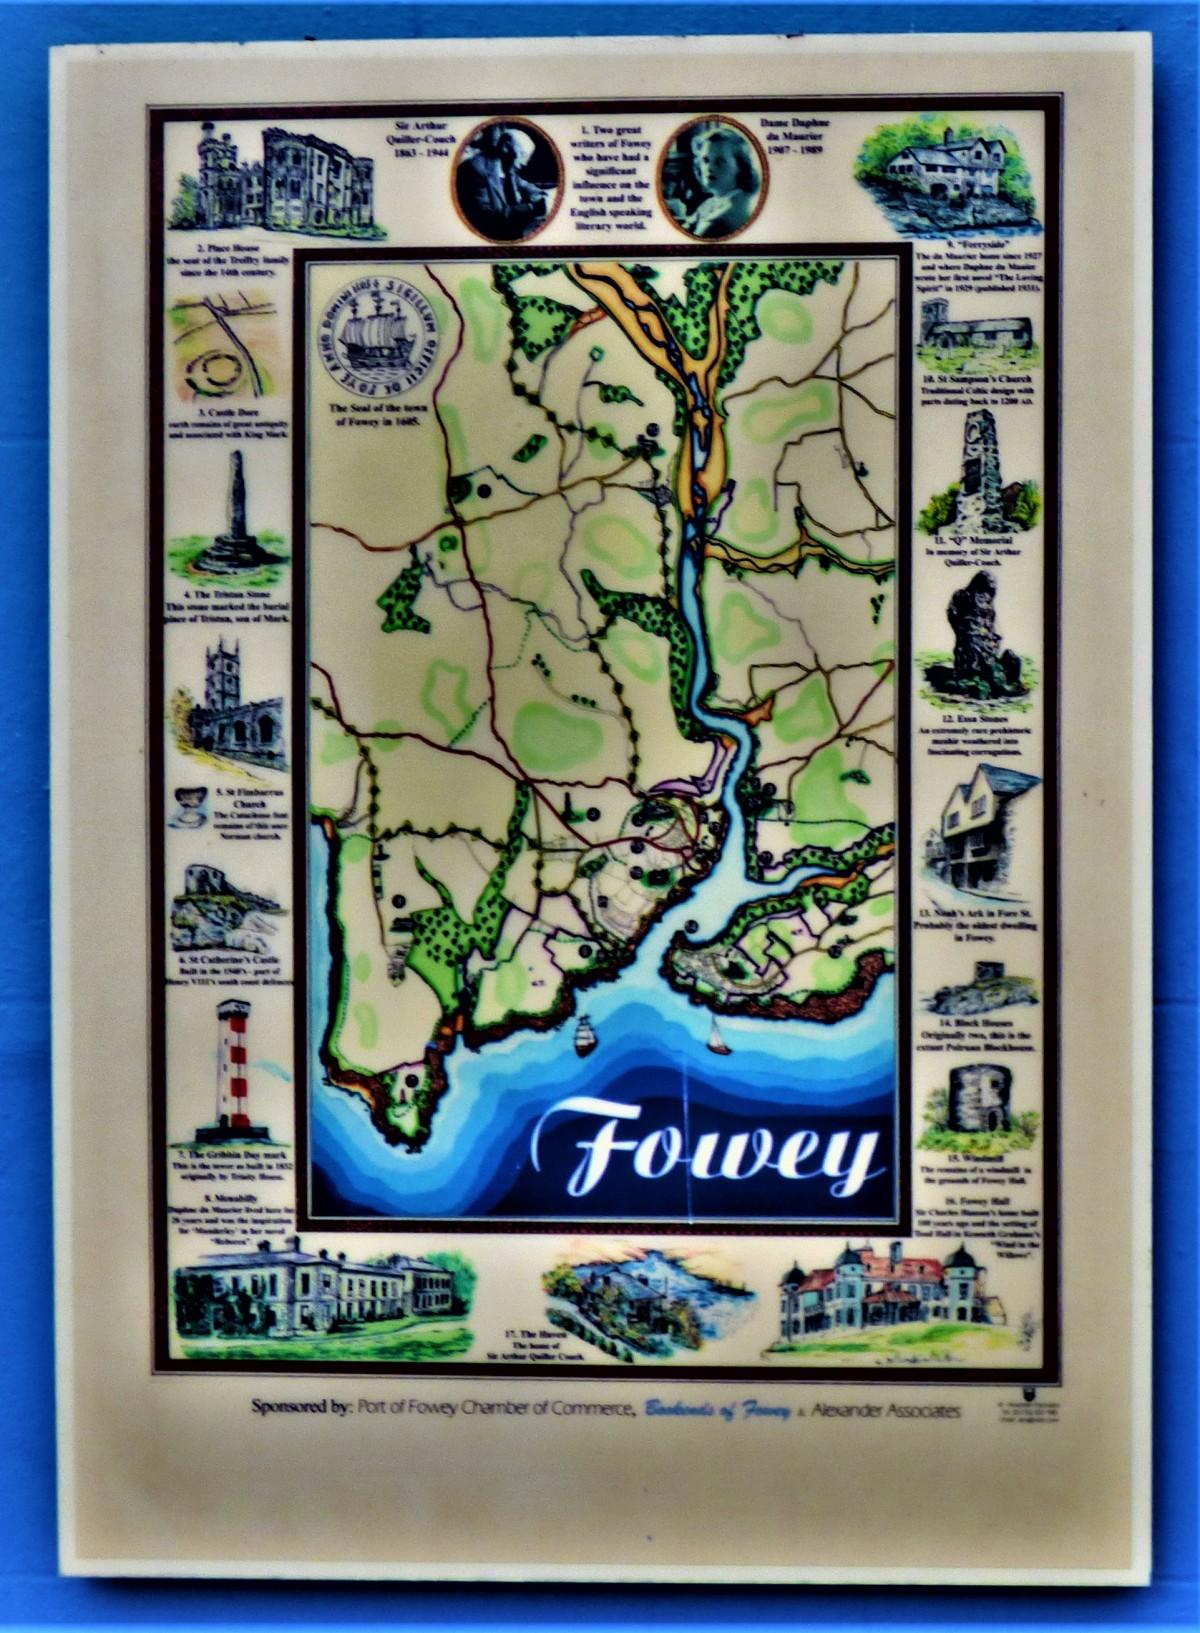 Cornish Winter Break 8:Fowey